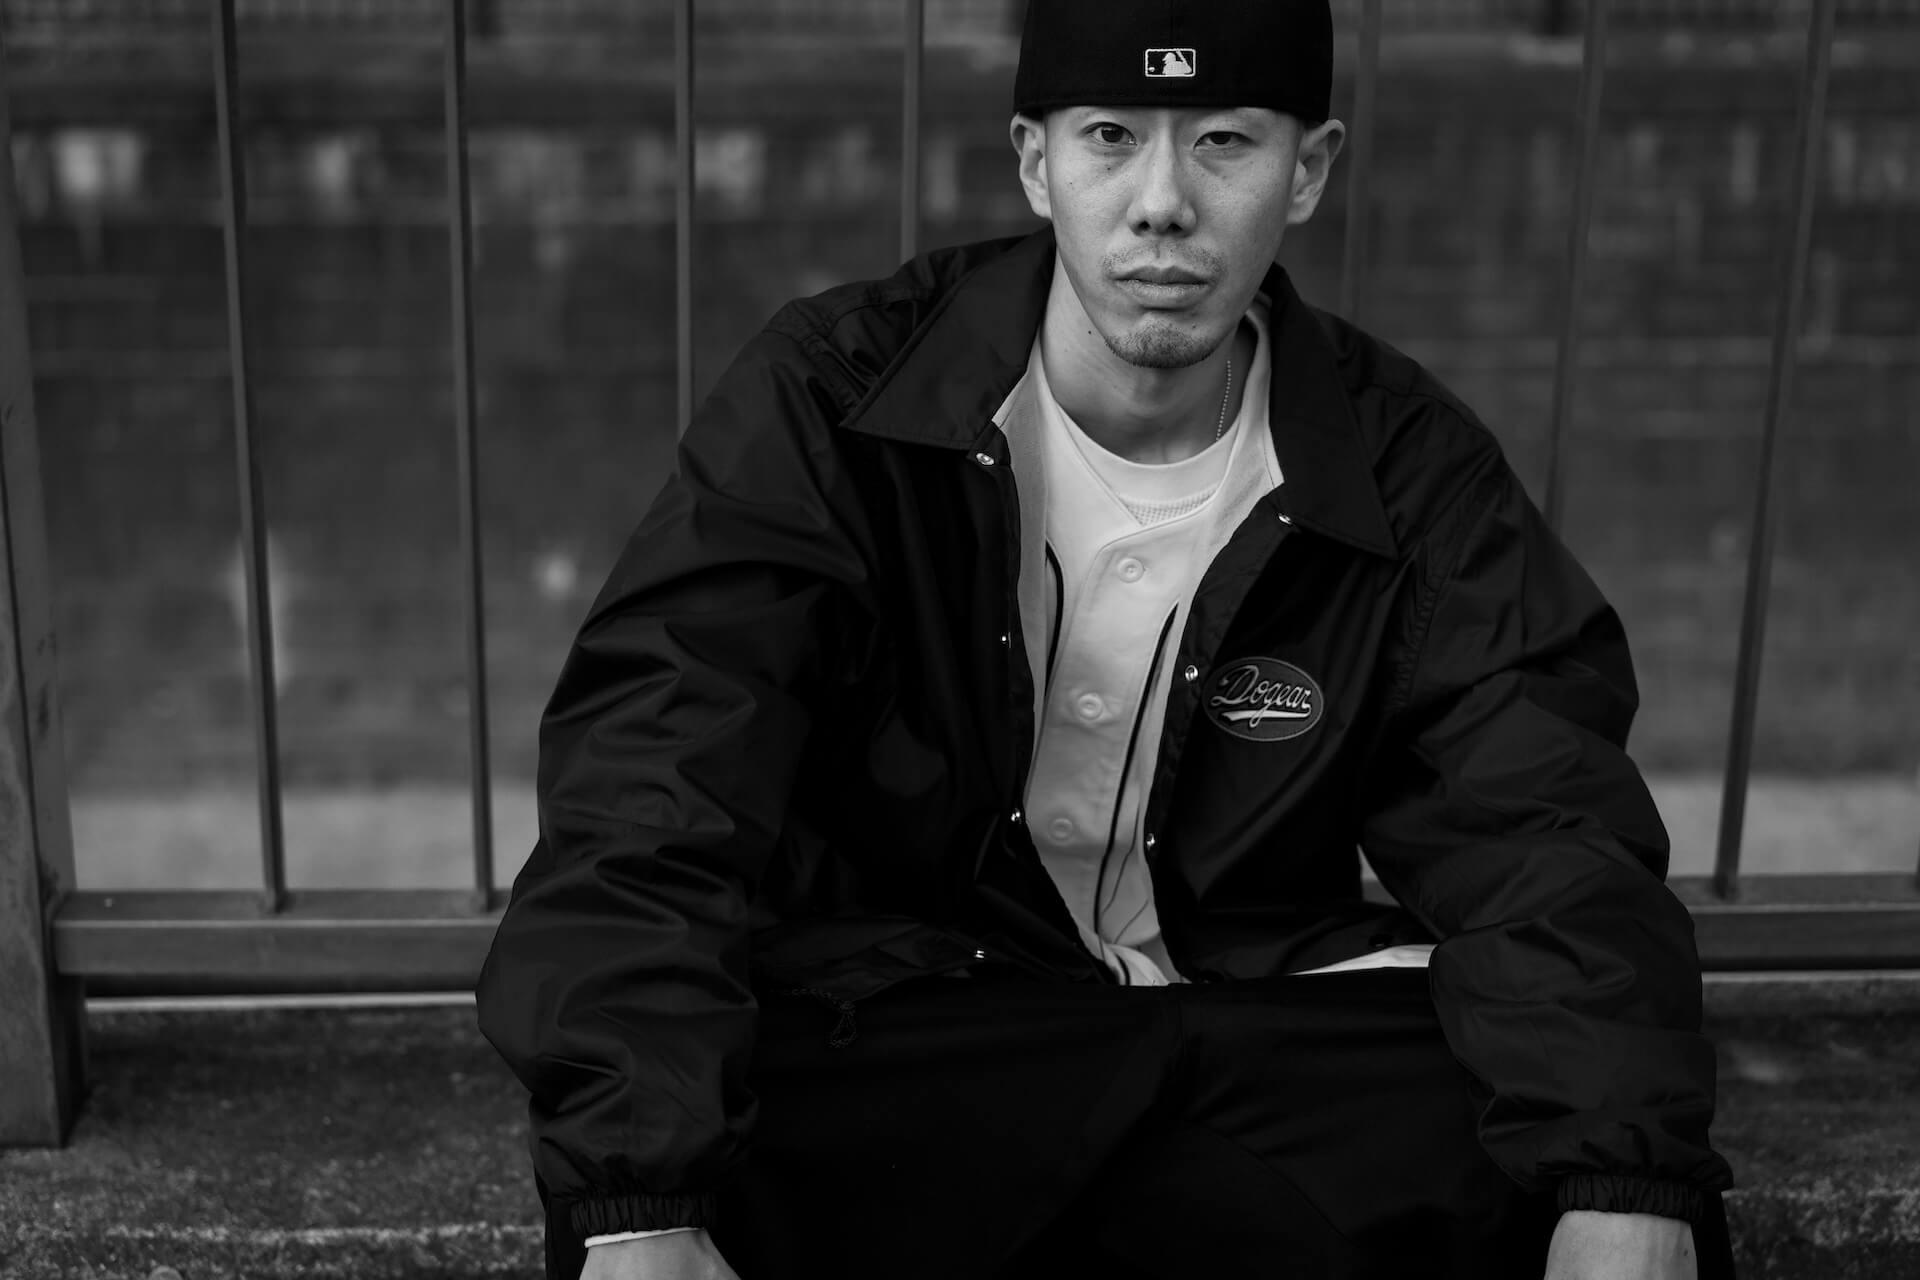 ISSUGI & DJ SHOEのミックスアルバム『Both Banks』がついにリリース!BLACKFILEでのインタビュー映像が公開 music210728_issugi_djshoe_3